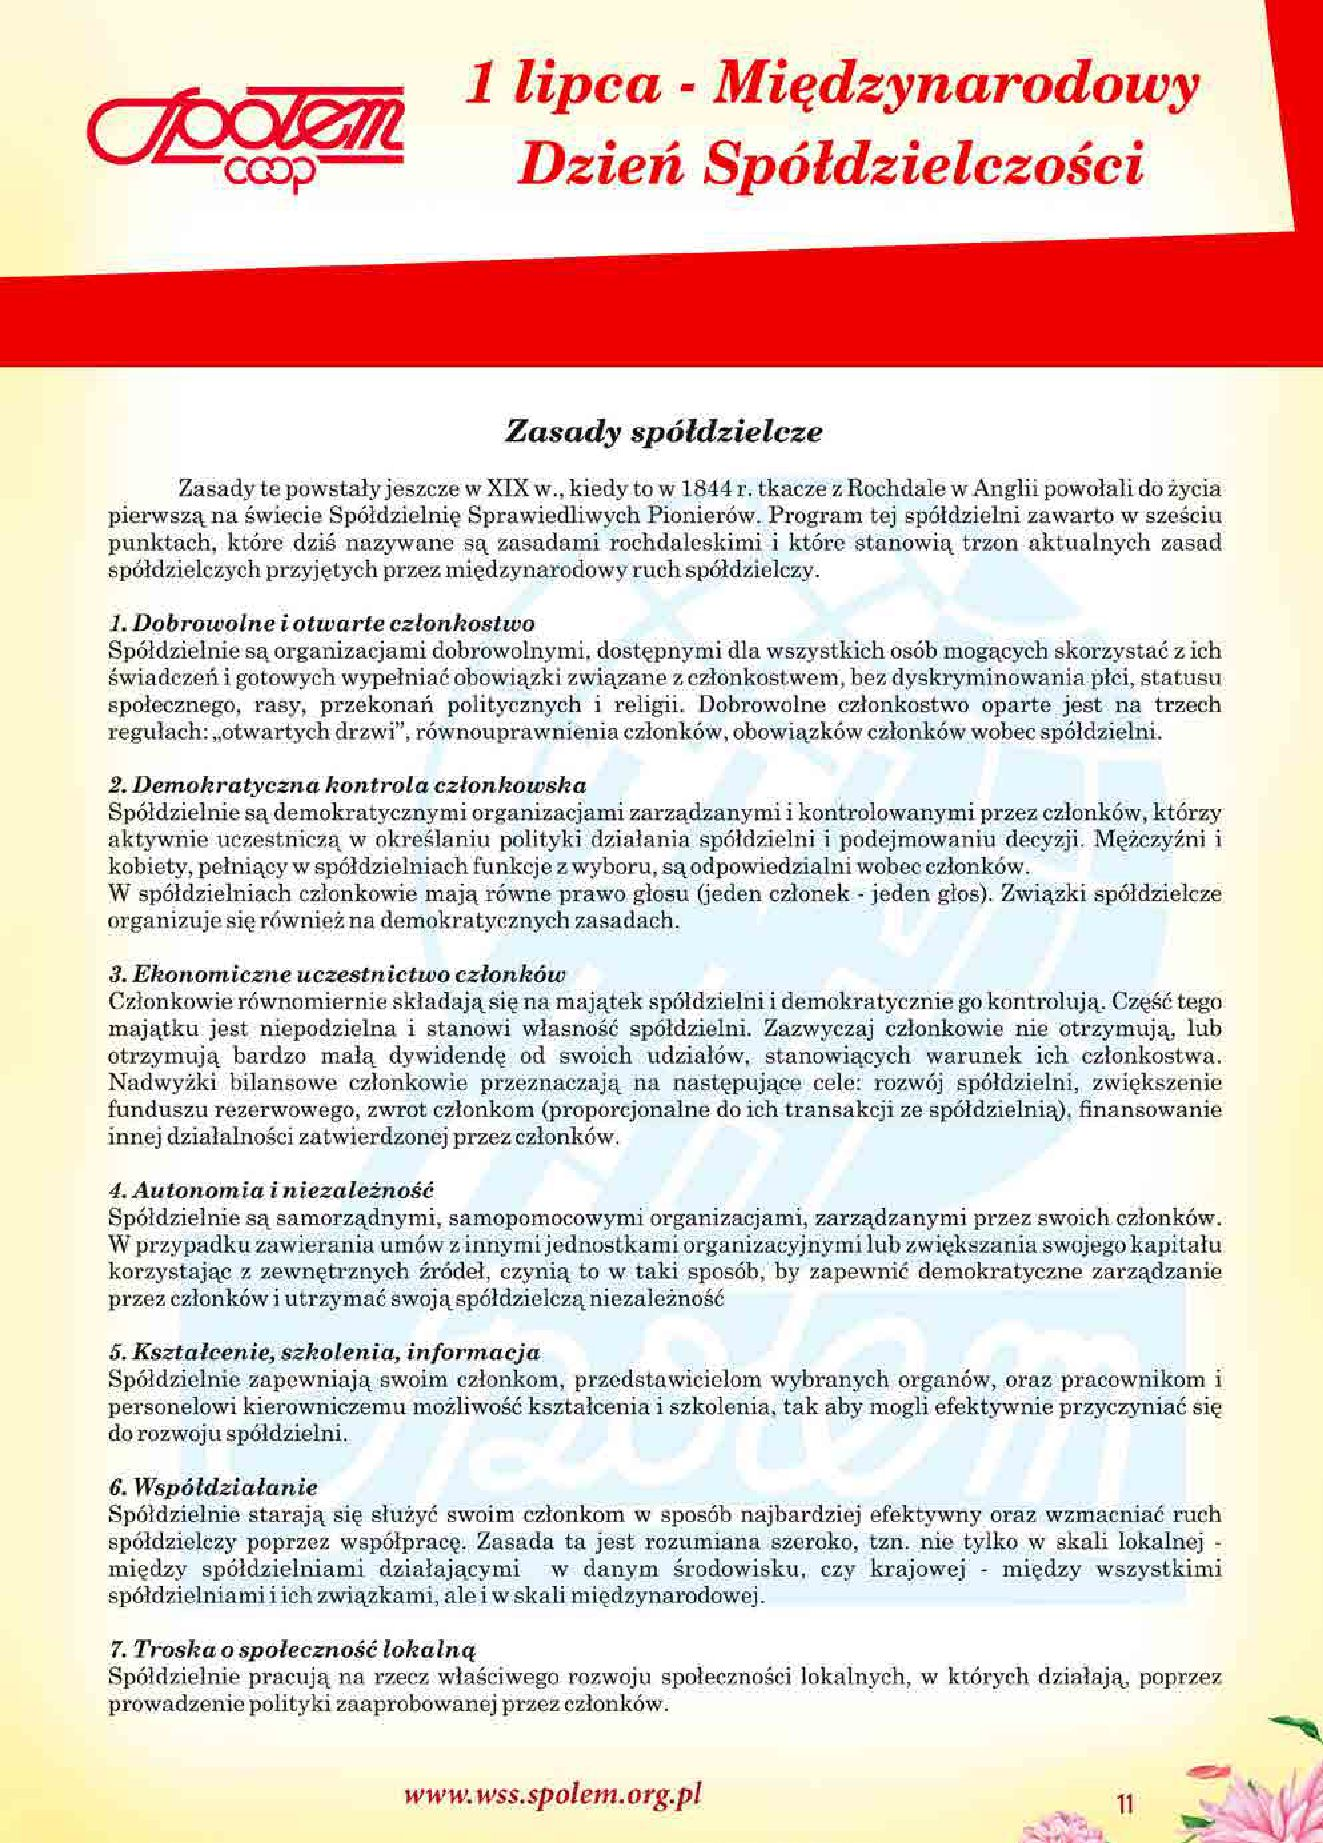 Gazetka Społem Sp z o.o.: Gazetka Społem Sp z o.o. 2021-07-01 page-11